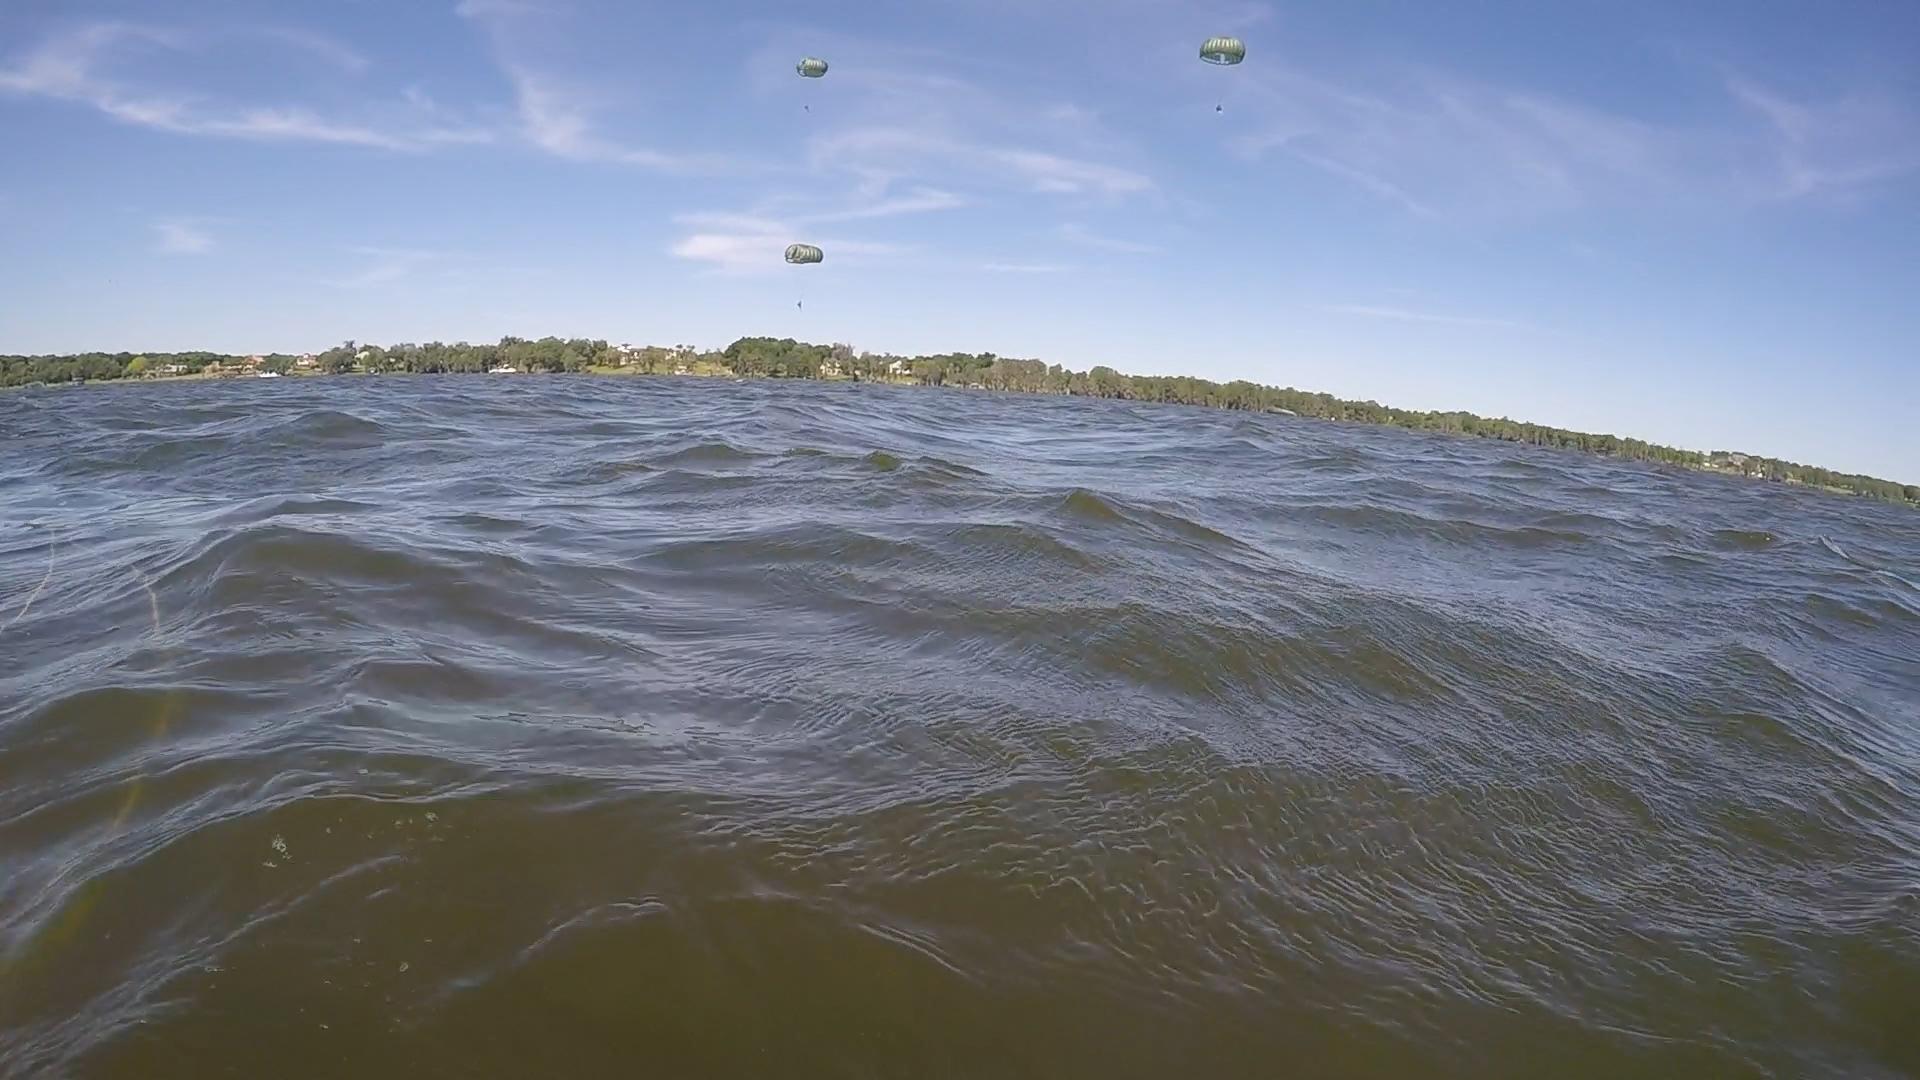 Airborne - 160409 - next pass 2.jpg